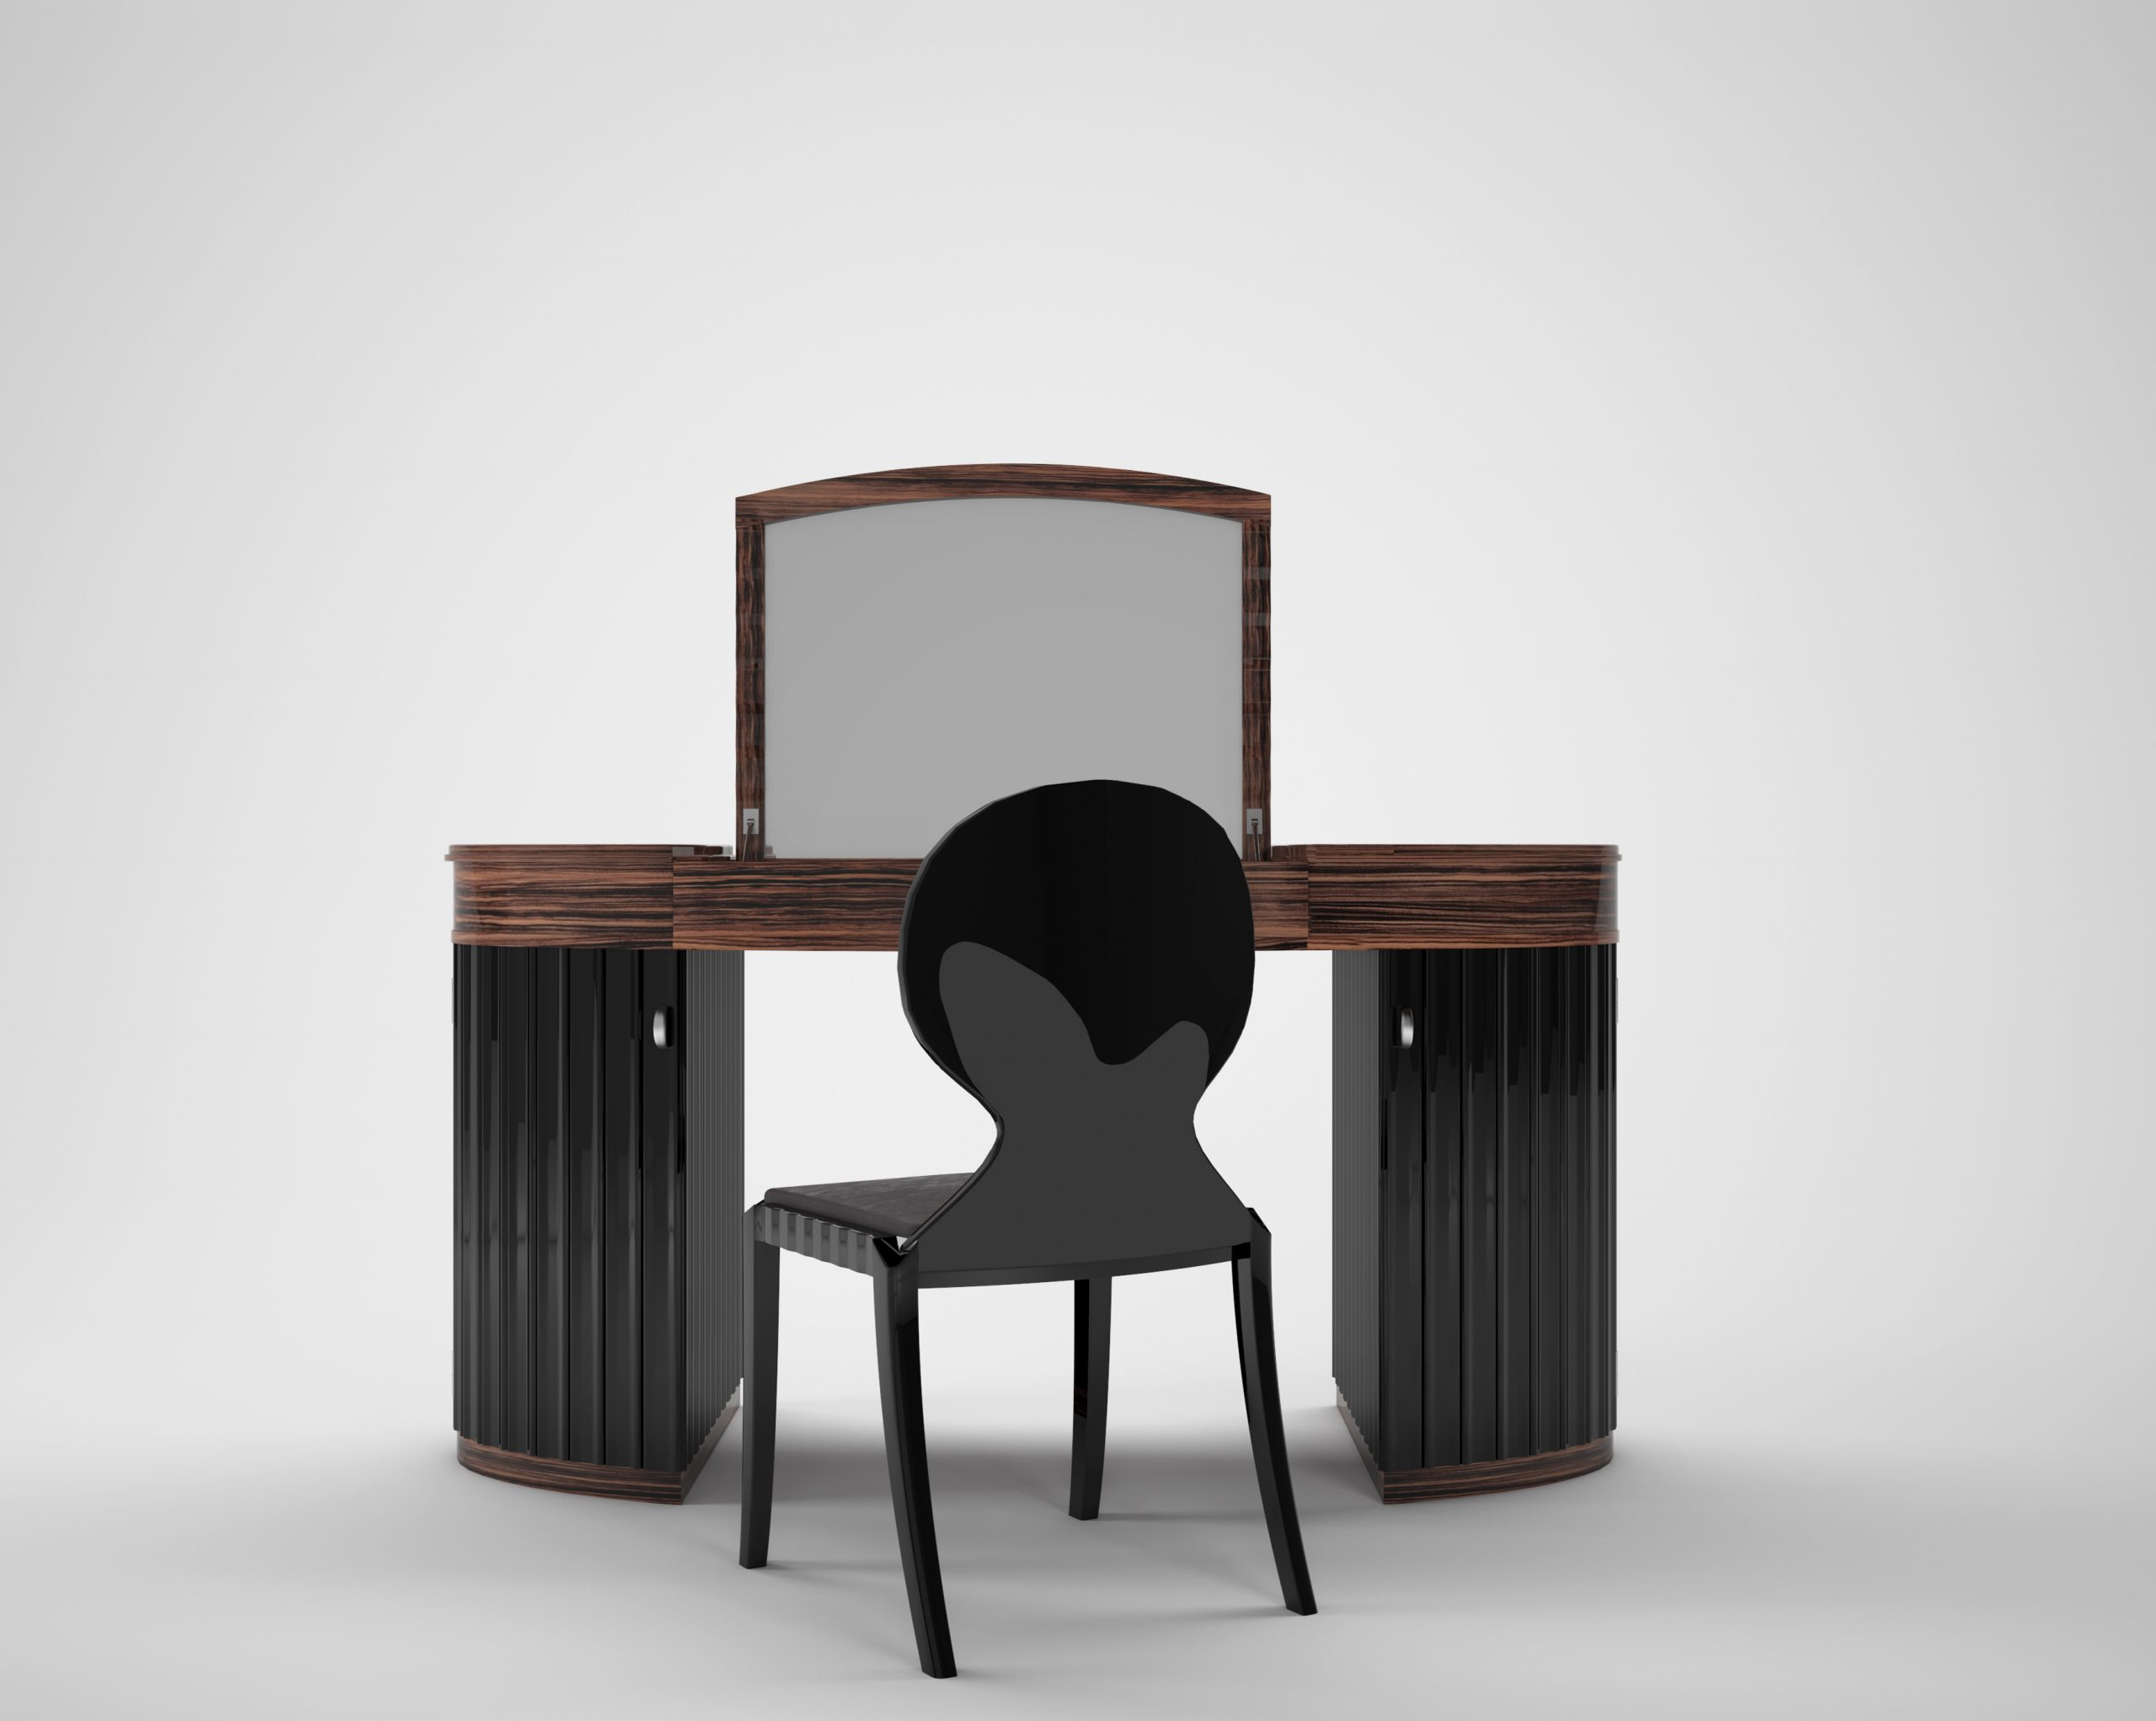 Full Size of Art Deco Makassar Schminktisch Original Antike Mbel Luxus Schlafzimmer Lampen Weißes Sitzfläche Stuhl Klappstuhl Garten Komplettangebote Stehlampe Schlafzimmer Schlafzimmer Stuhl